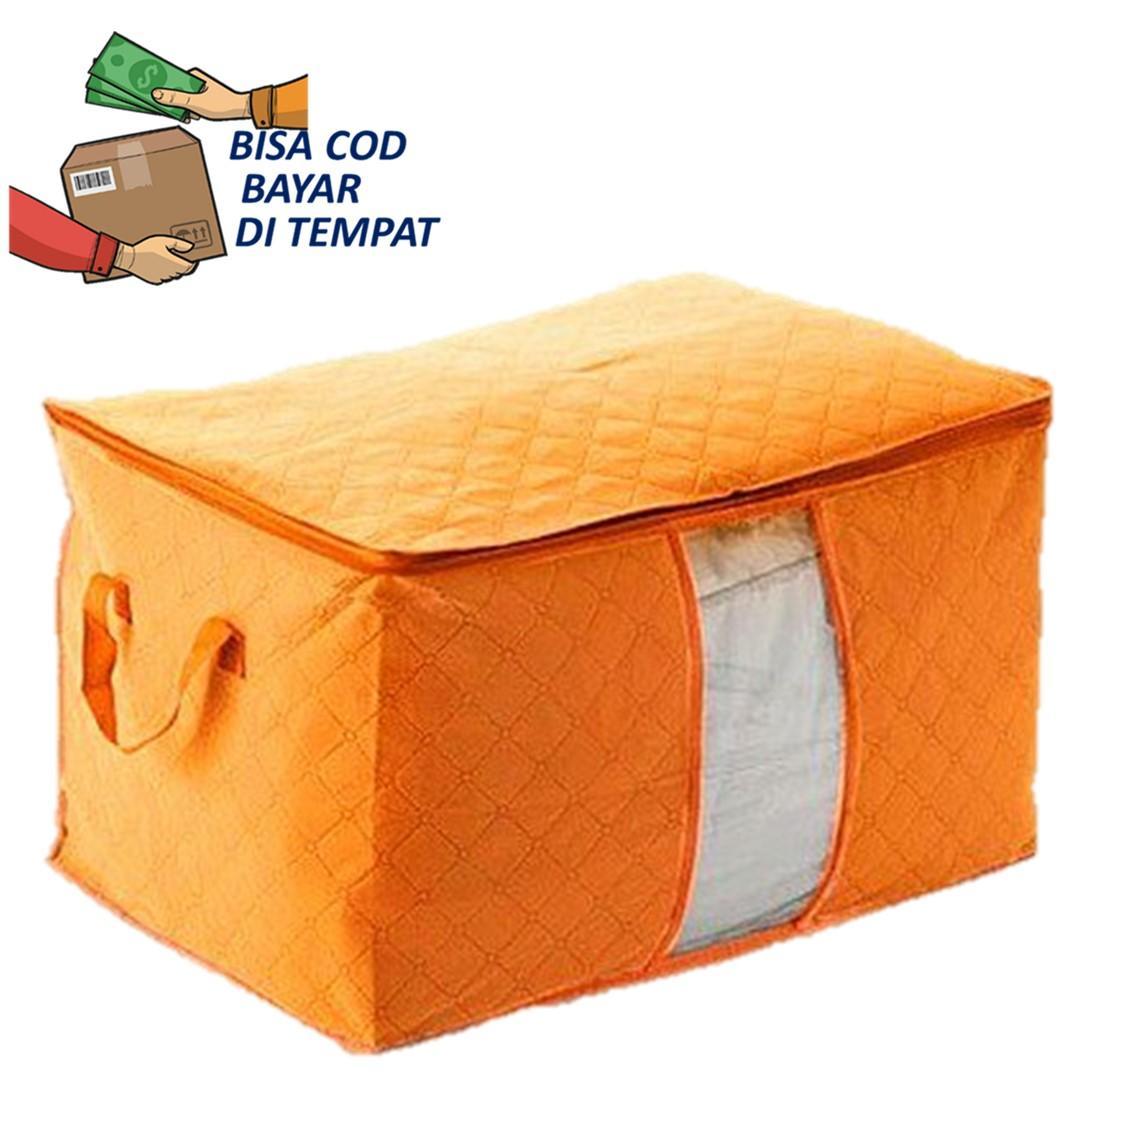 Storage Bag Storage Box Colorful Storage Organizer Bag Box Praktis Travel